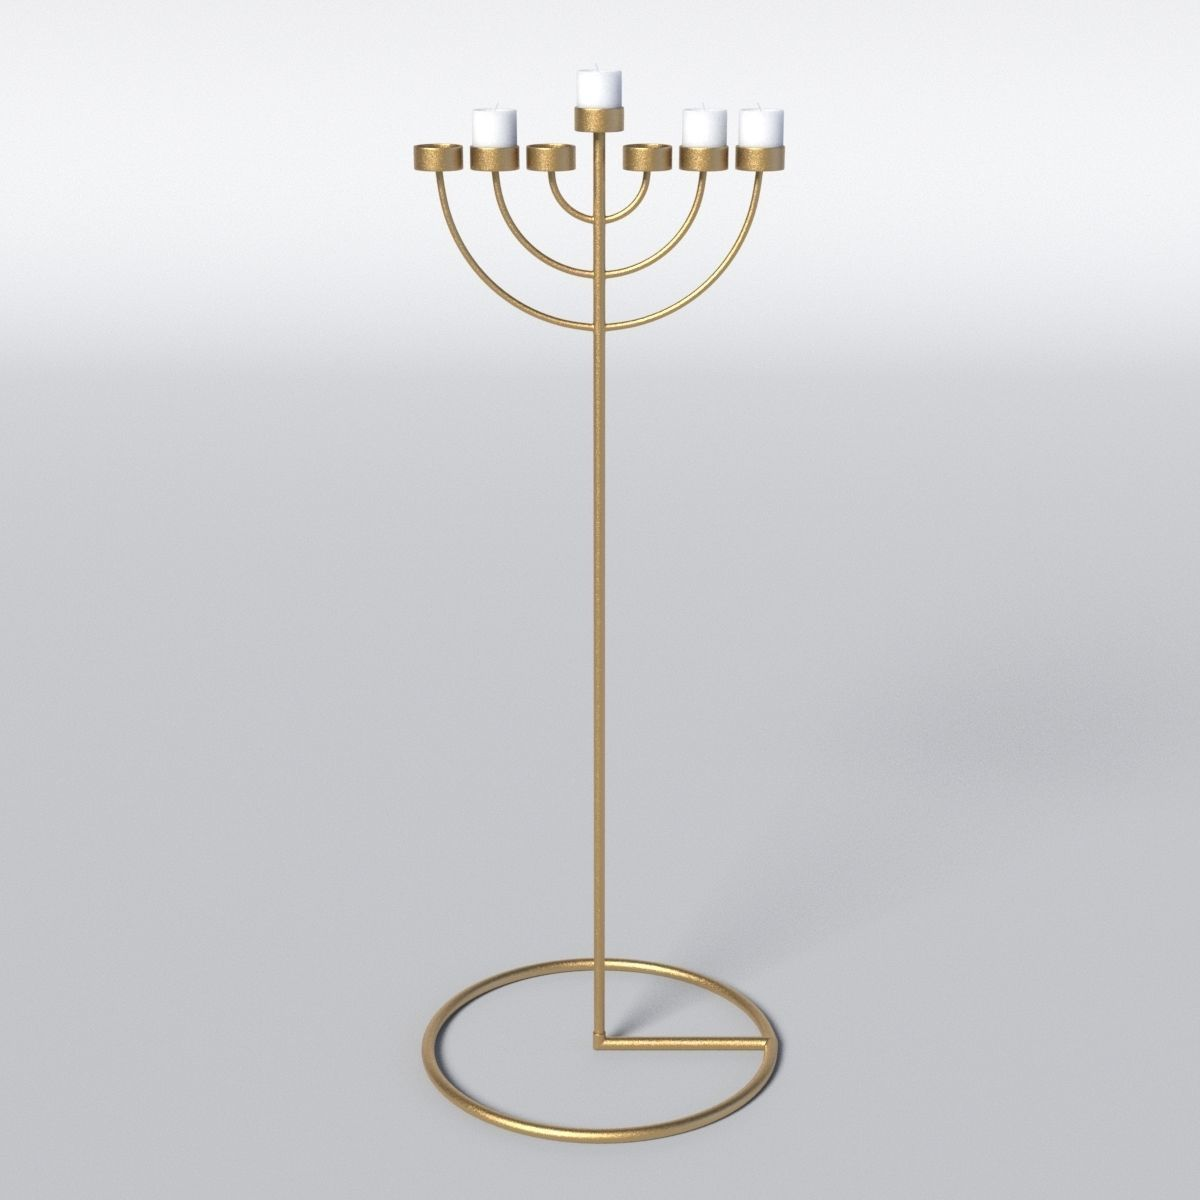 Copper Menorah 7 Candles